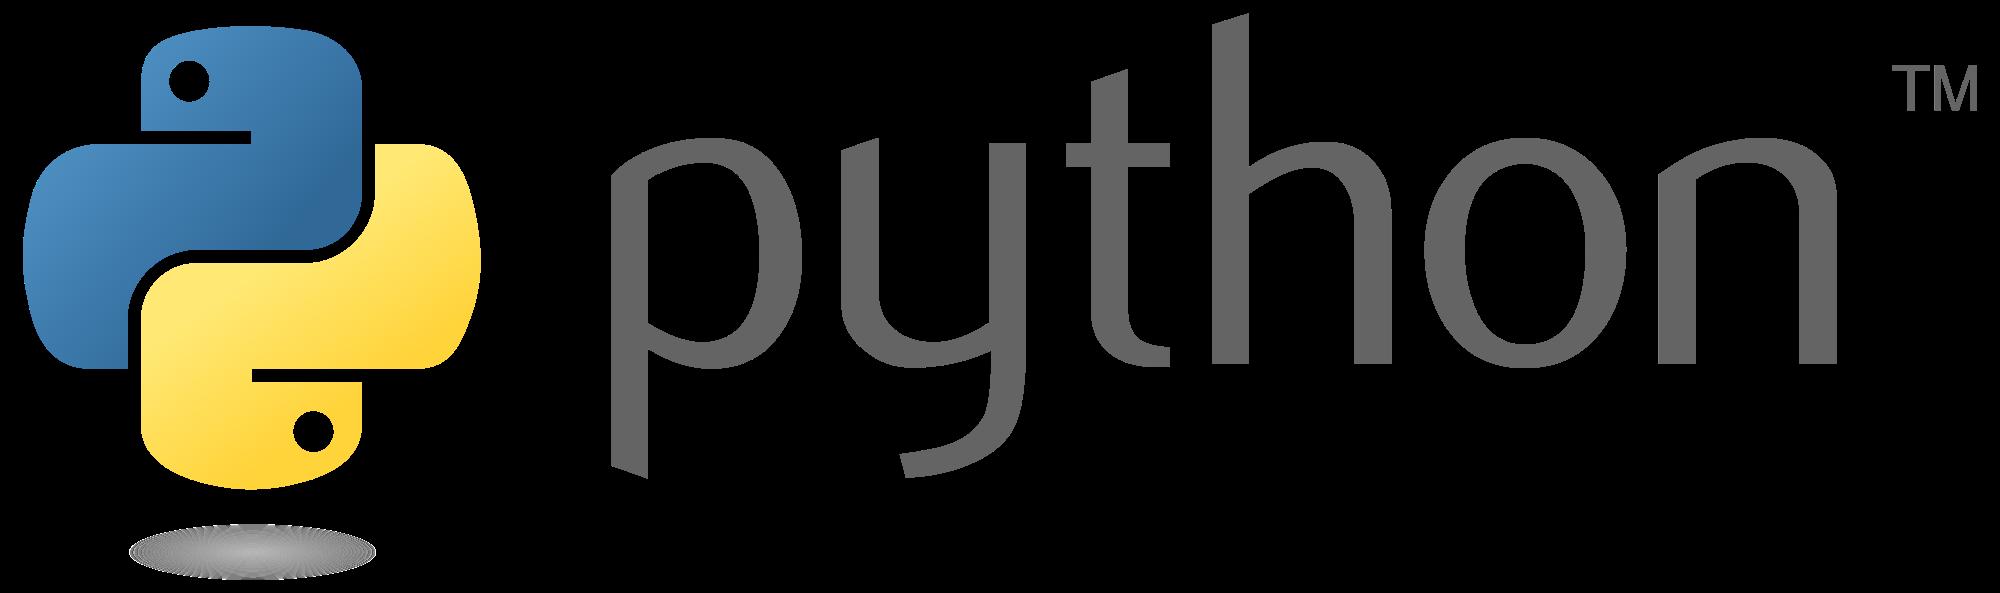 Pyrhon